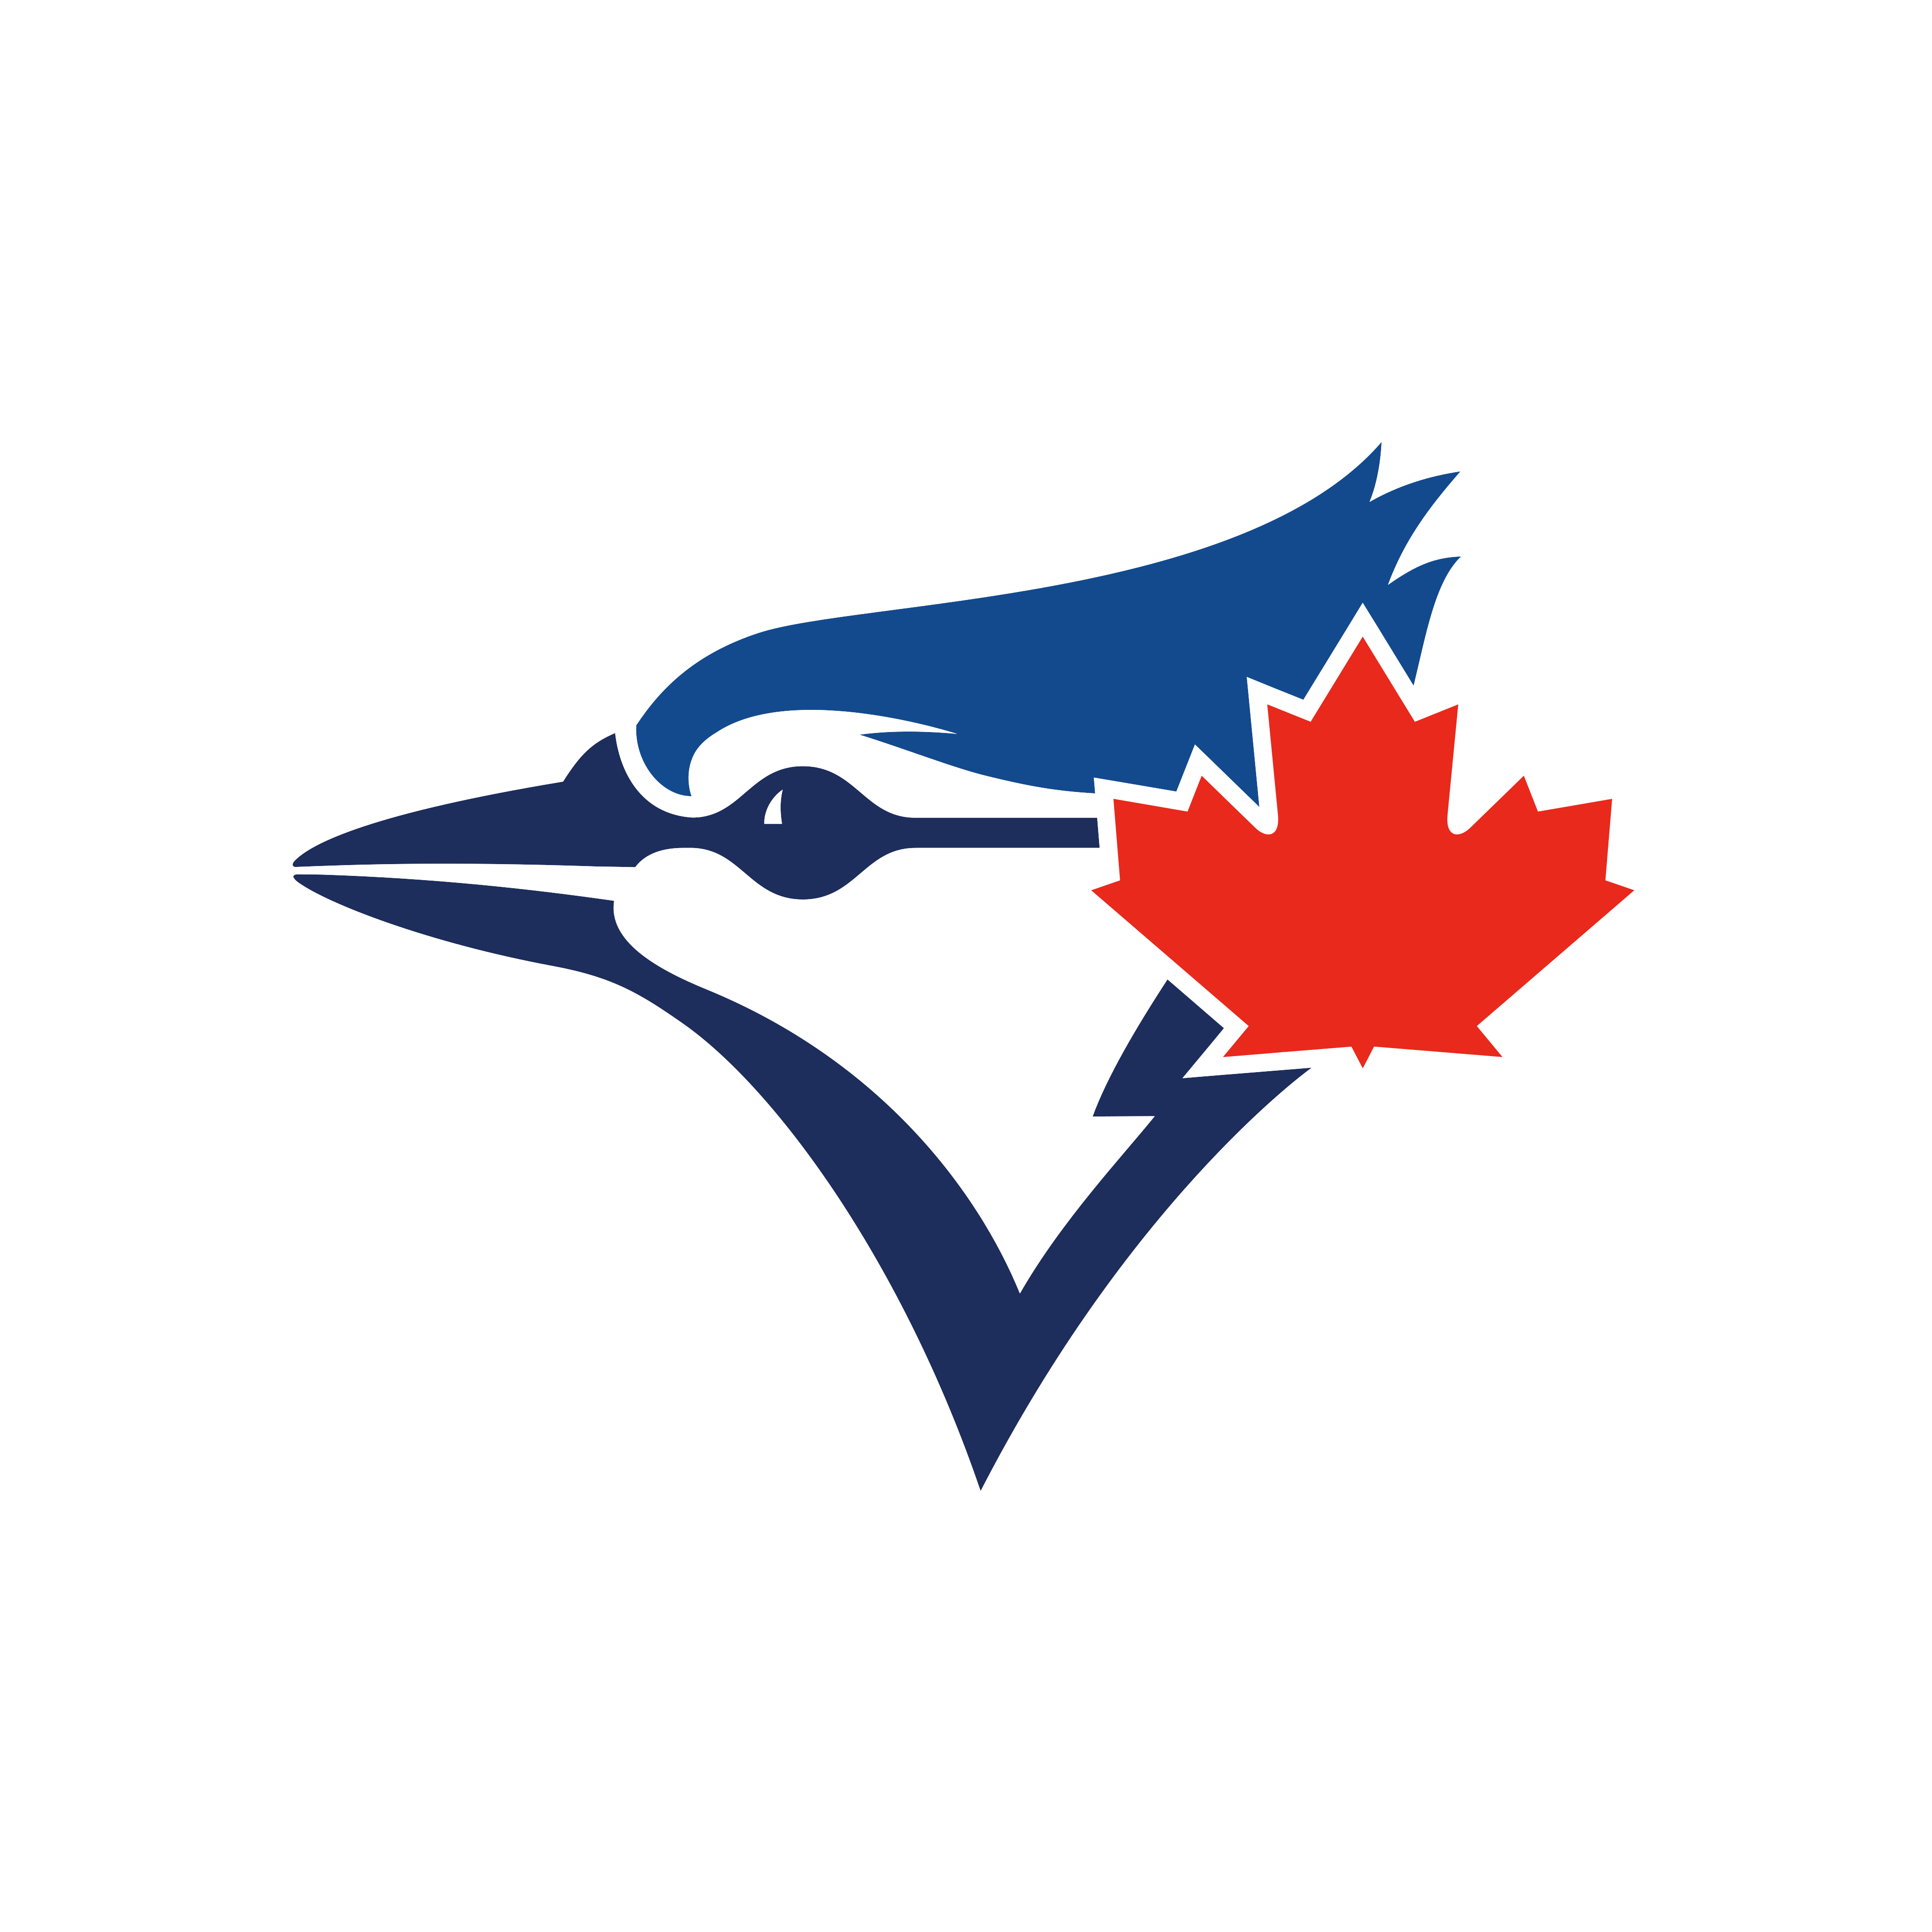 toronto blue jays logo 0 - Toronto Blue Jays Logo